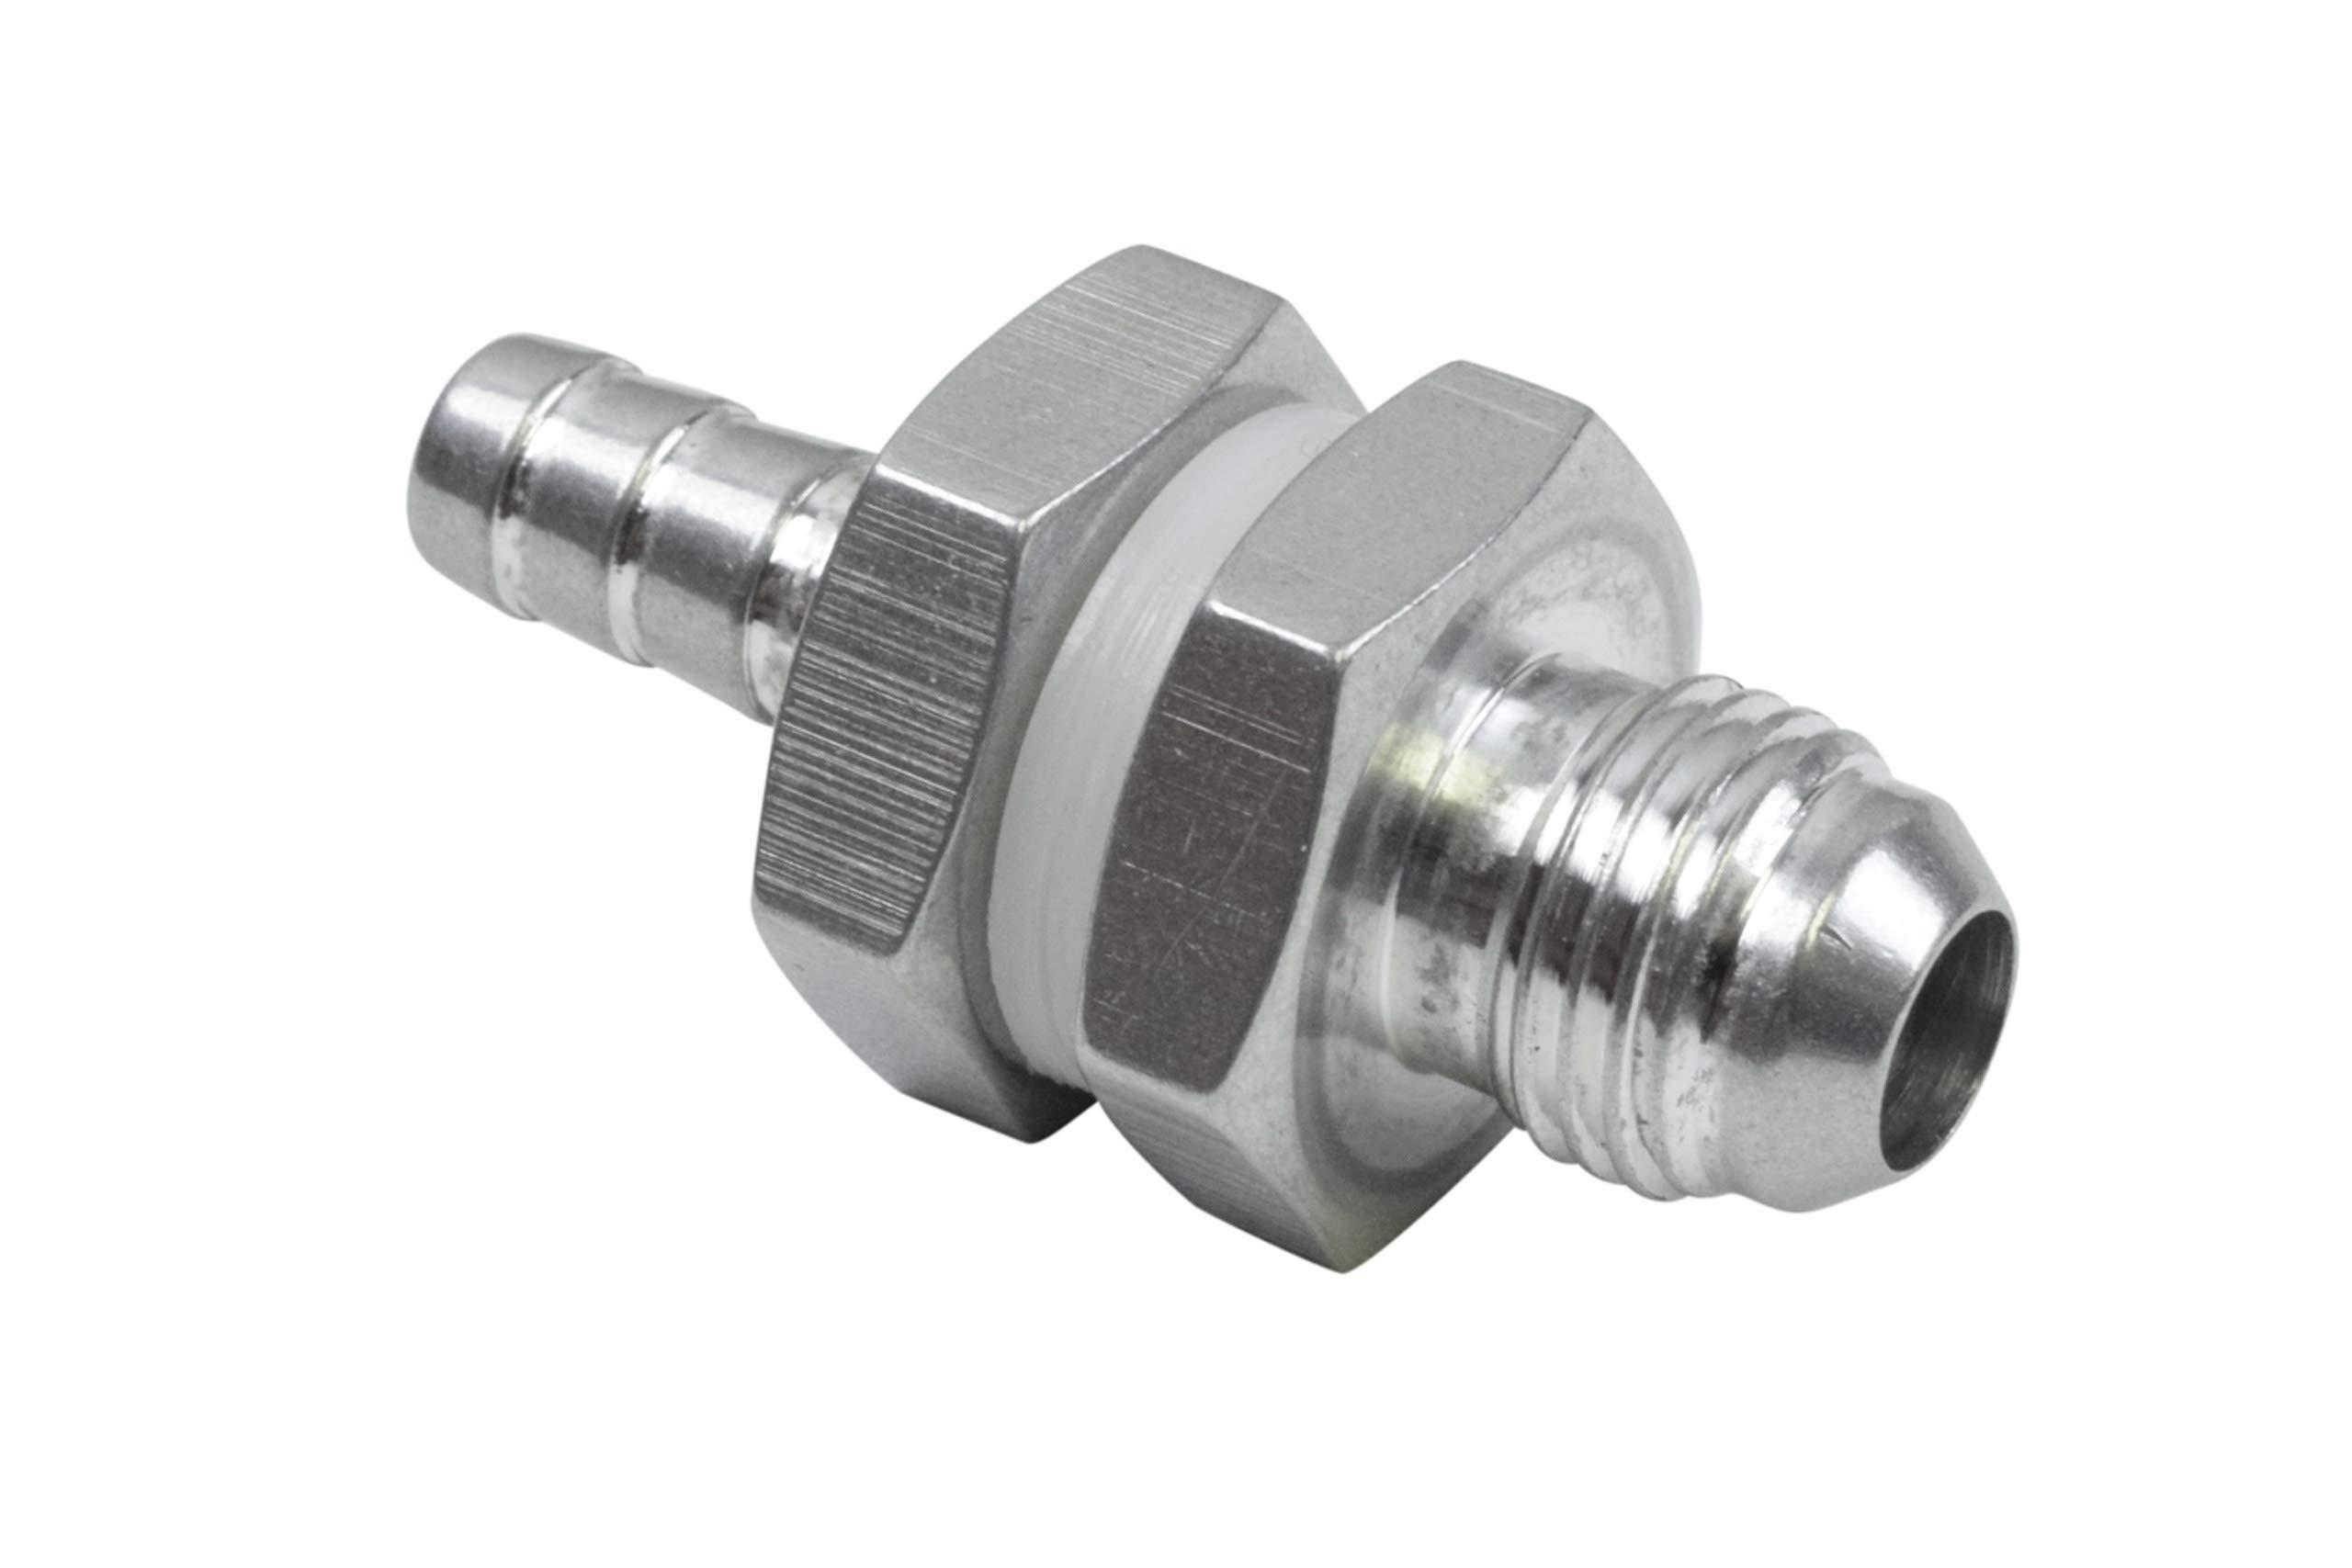 "ICT Billet -6AN Male Straight to 5/16"" .3125 Hose Barb Double Fuel Pump Tank Fitting Bulkhead Adapter AN861-06-31A Fluid Reservoir Plumbing Oil Port Bare Aluminum AN861-06-31A"